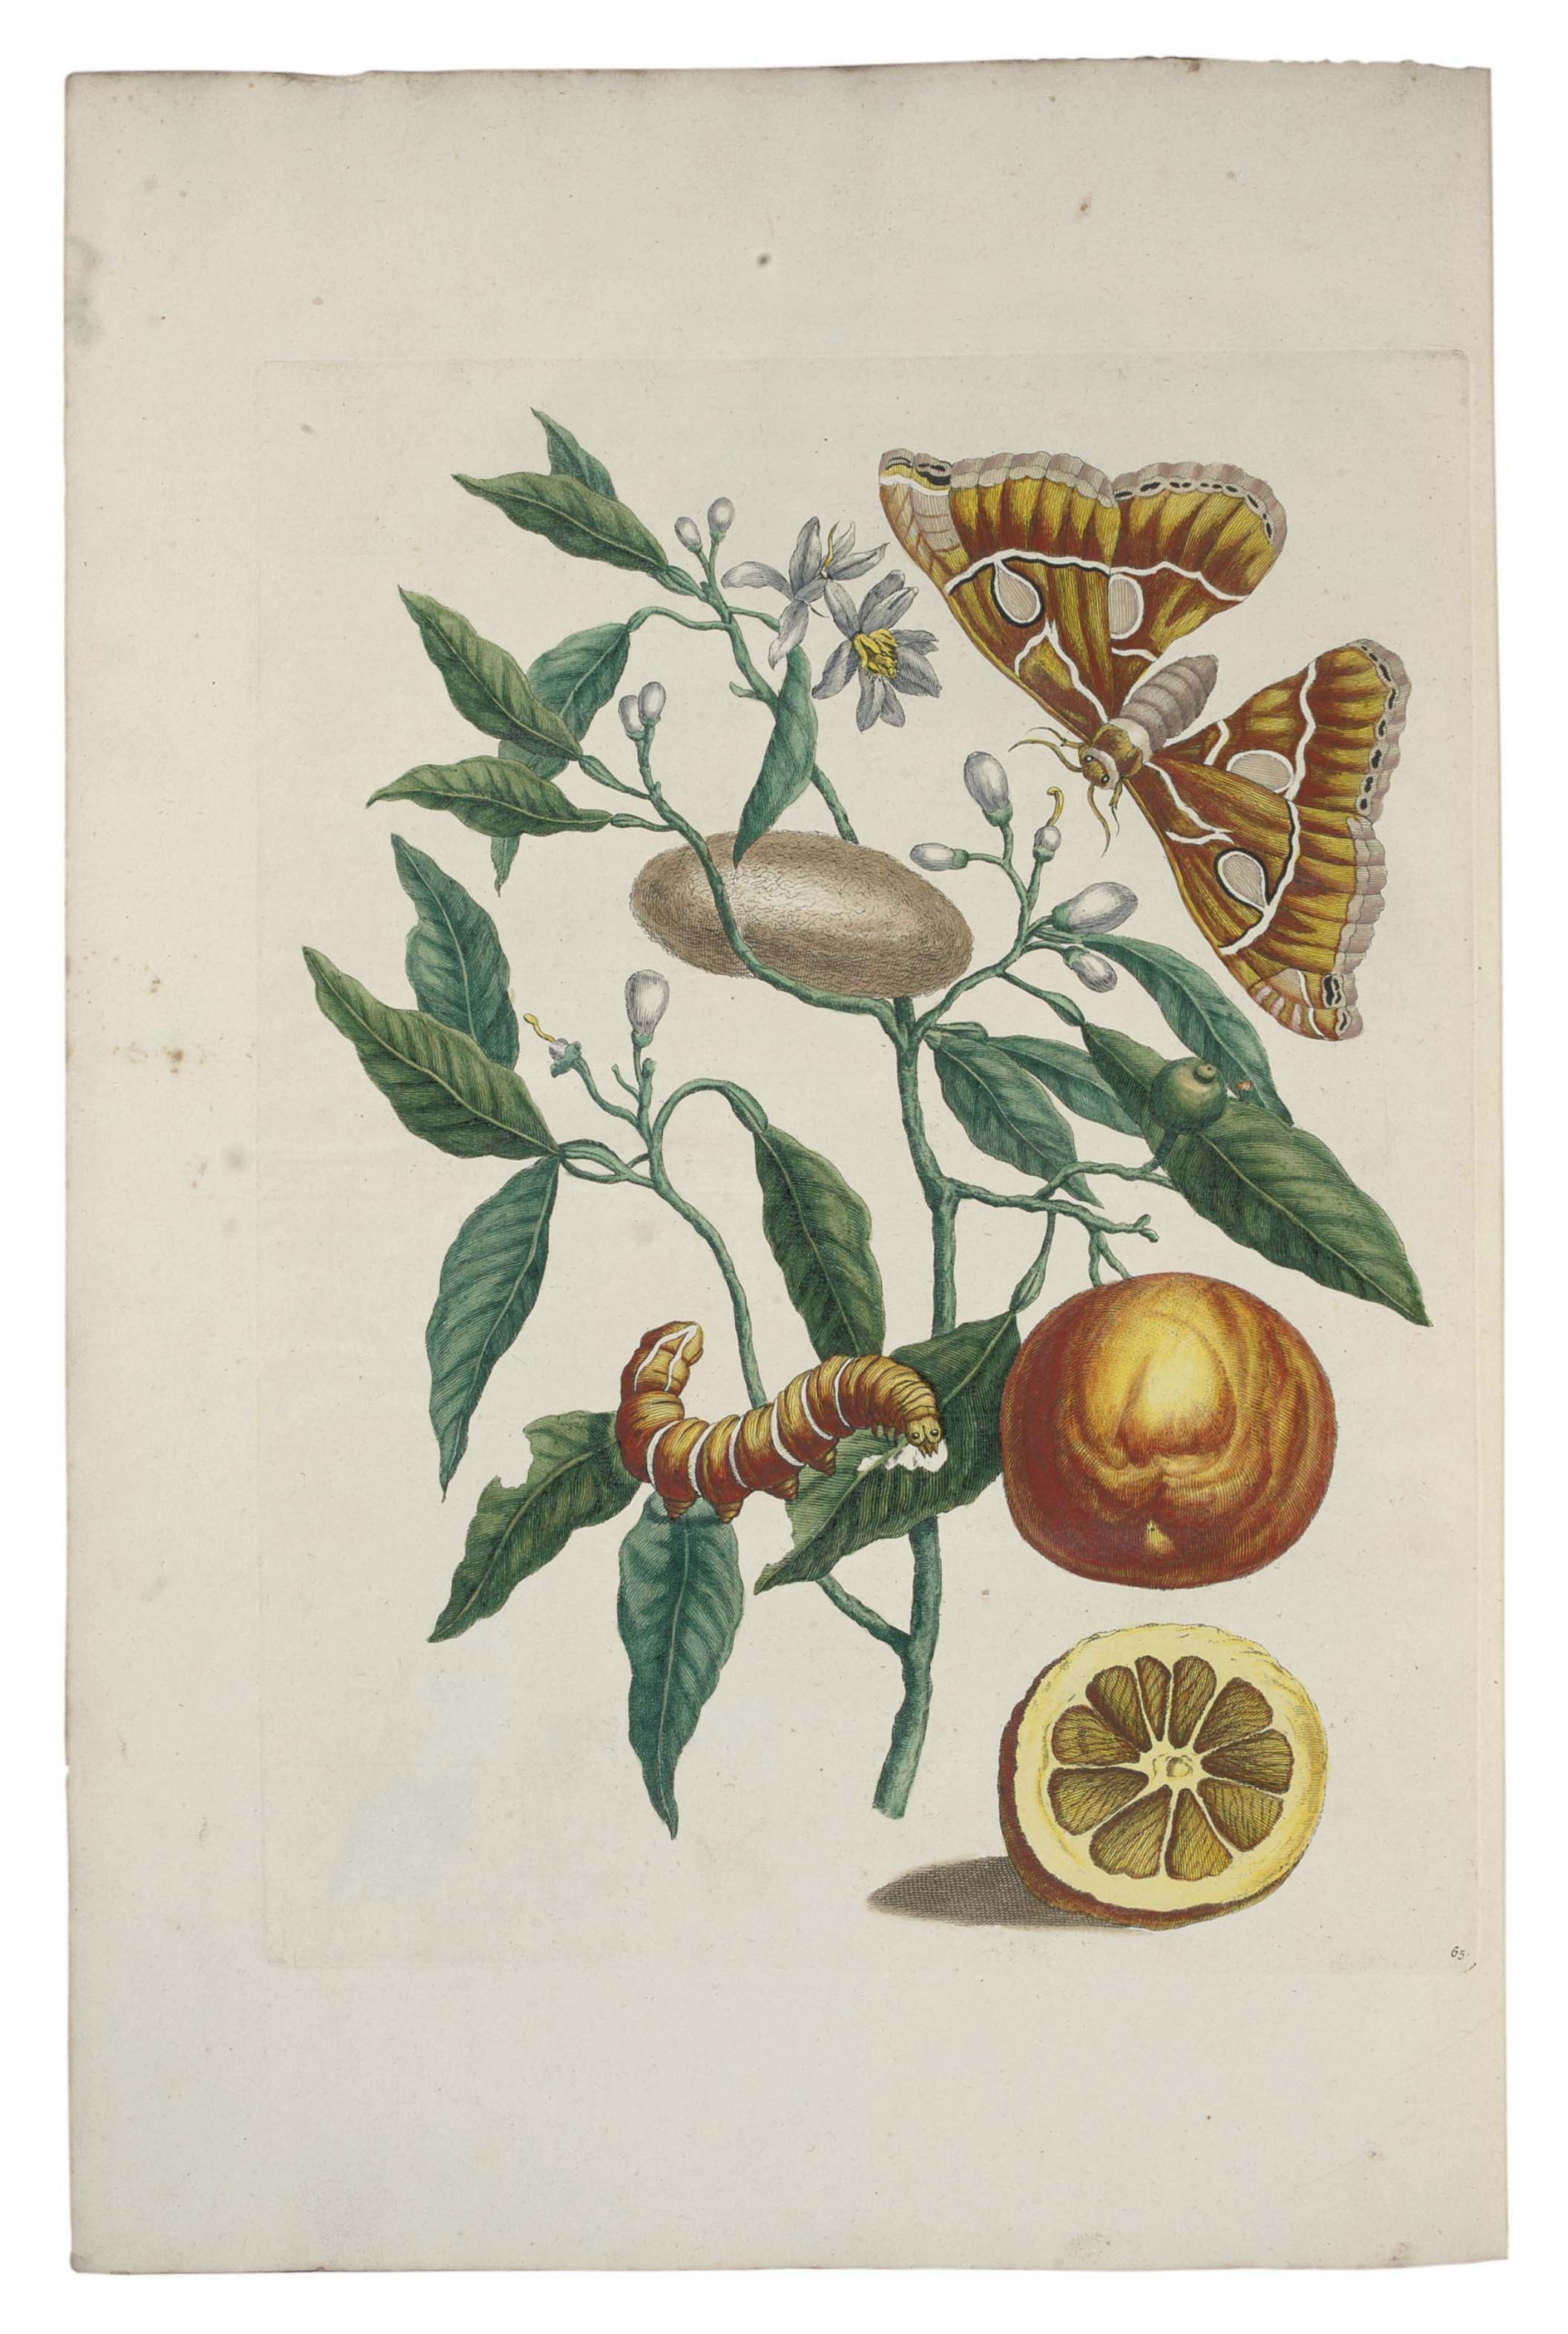 MERIAN, Maria Sibylla (1647-1717). Metamorphosis Insectorum Surinamensium. Ofte Verandering der Surinaamsche Insecten. Amsterdam: the author and Gerard Valck, [1705].